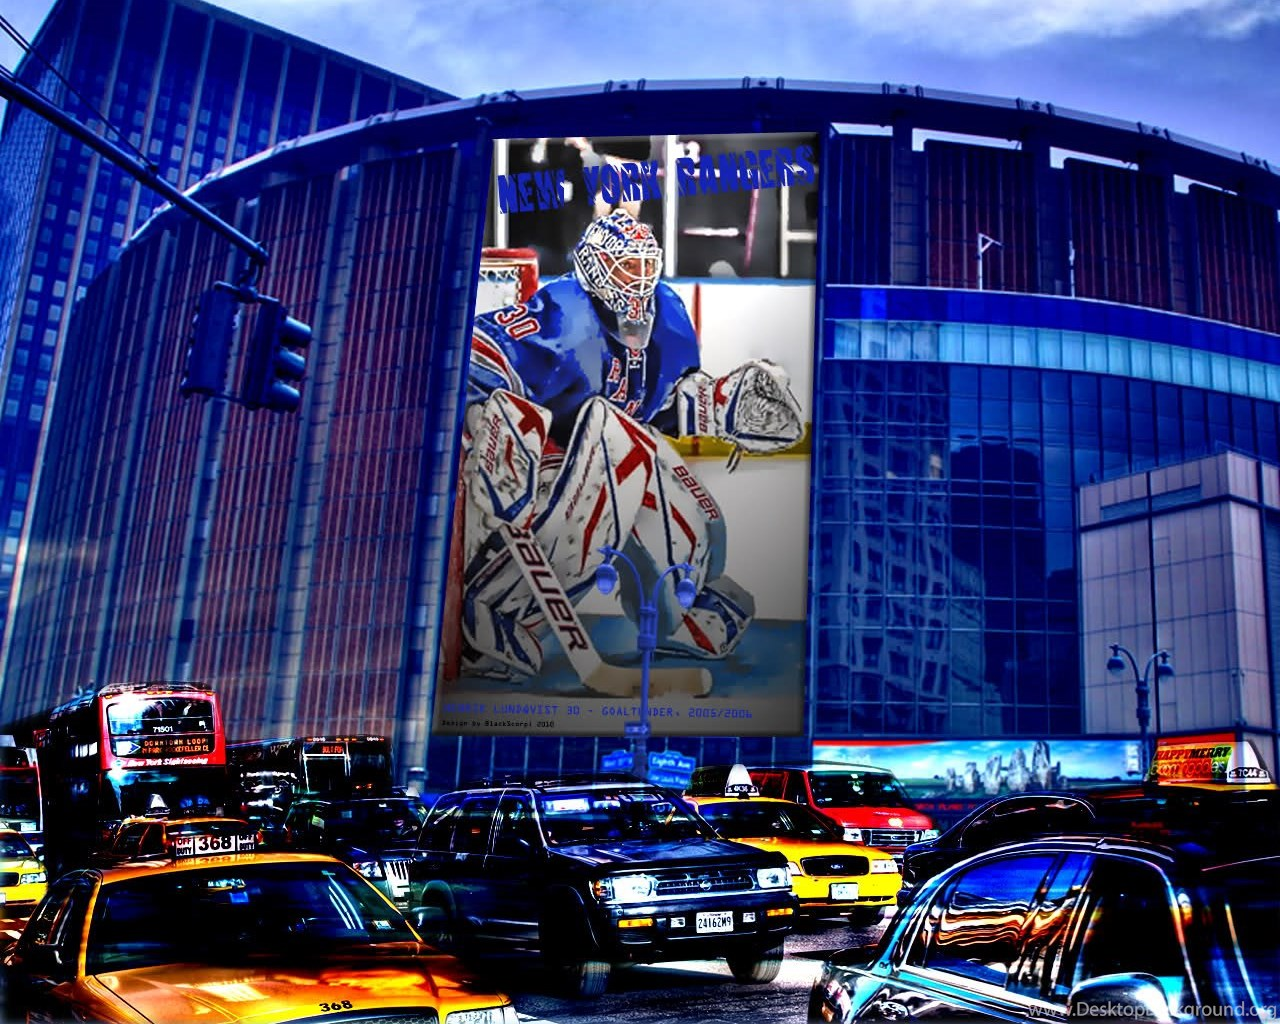 New York Rangers Iphone Wallpaper: Henrik Lundqvist, New York Rangers, Wallpapers Pictures